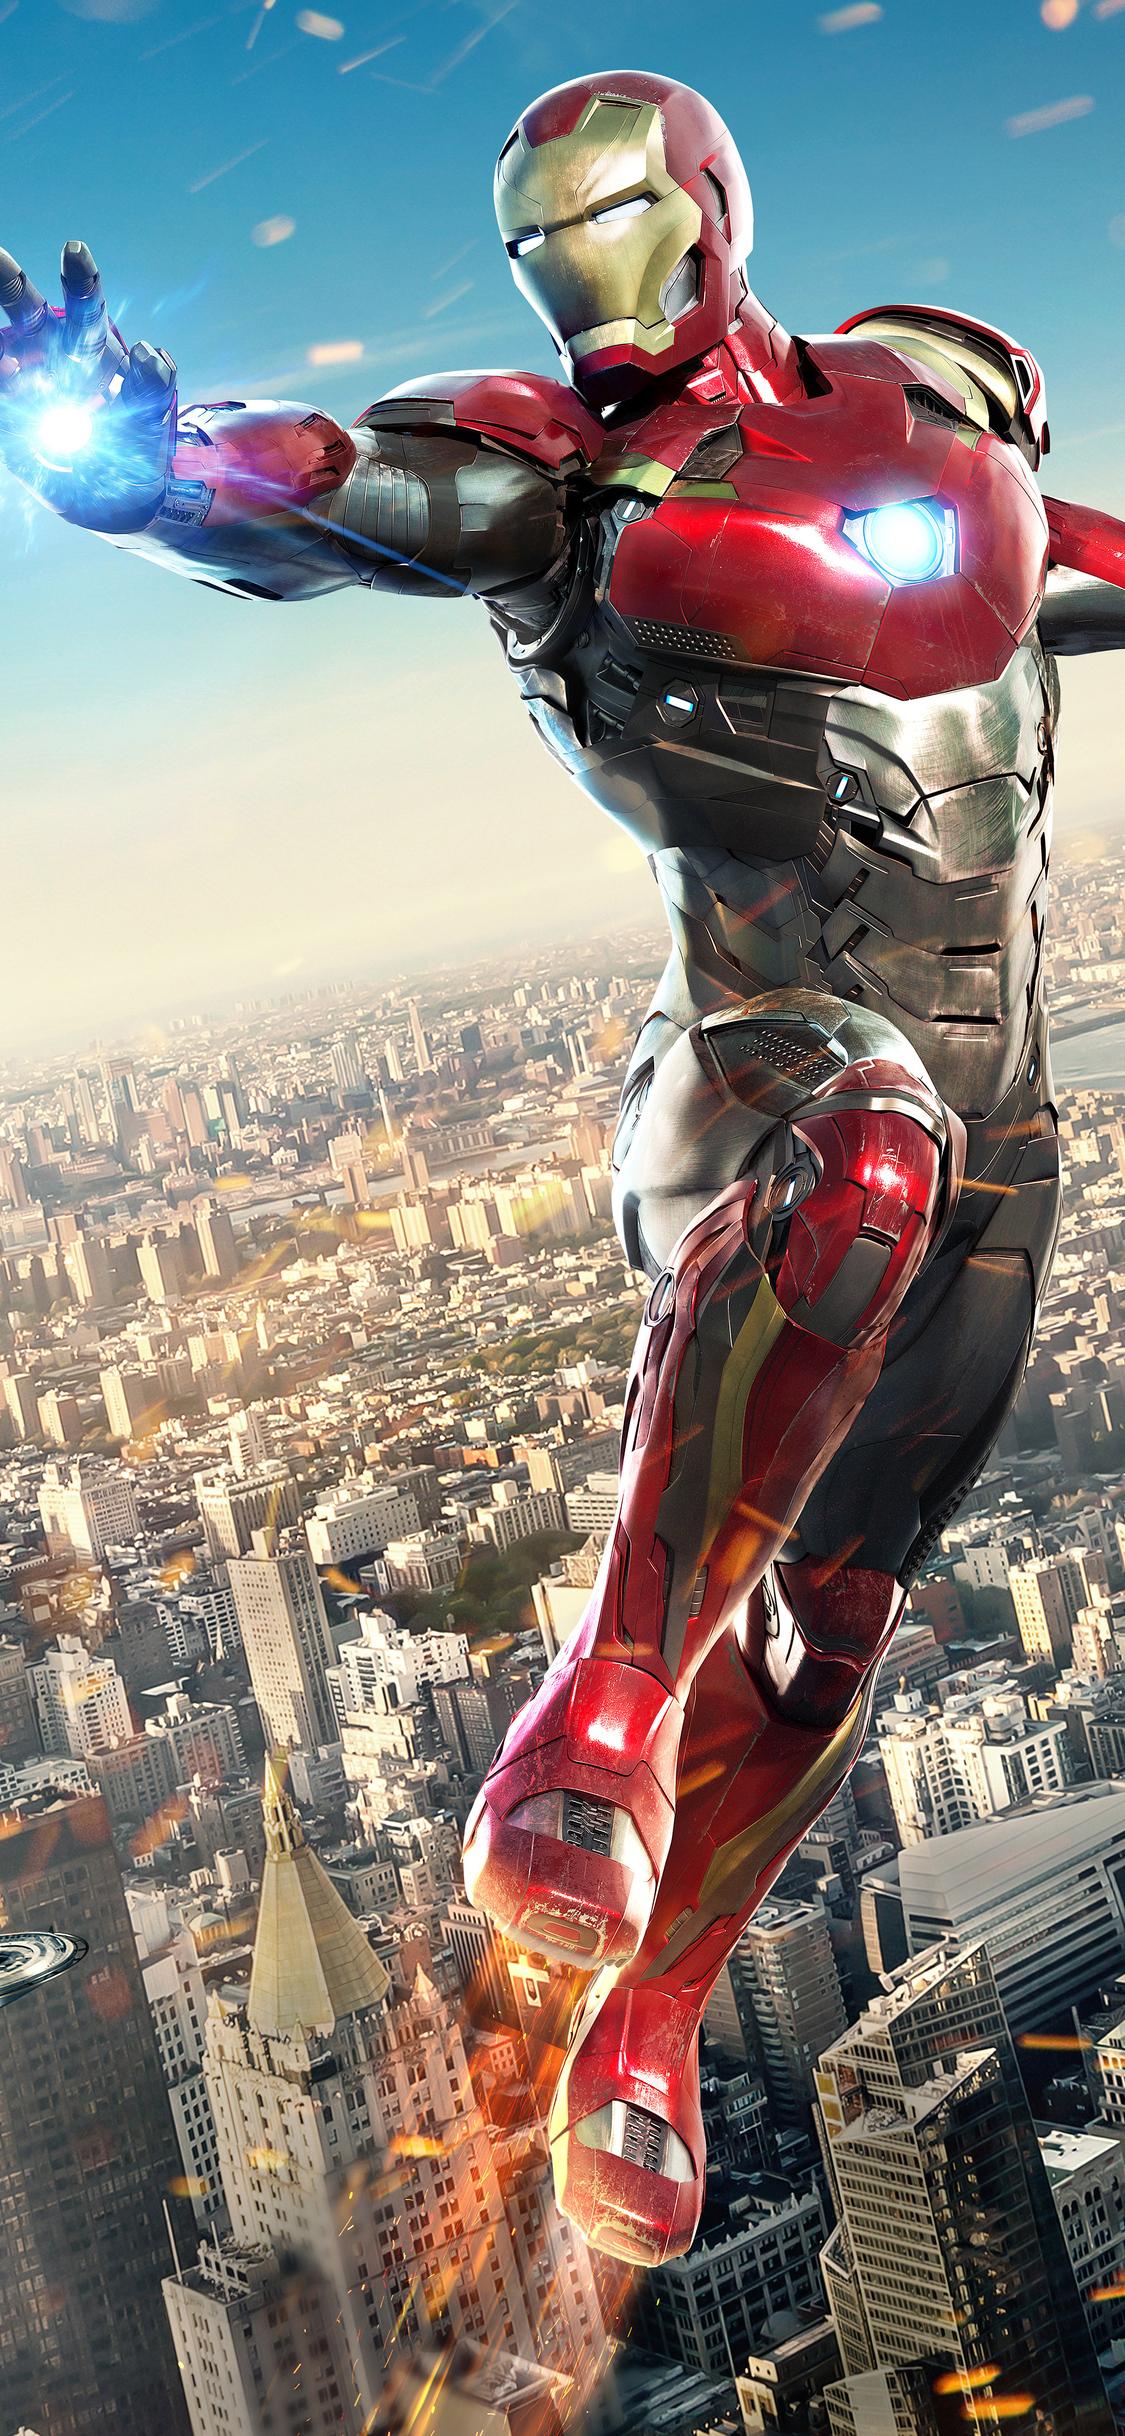 iron-man-in-spiderman-homecoming-4k-lm.jpg